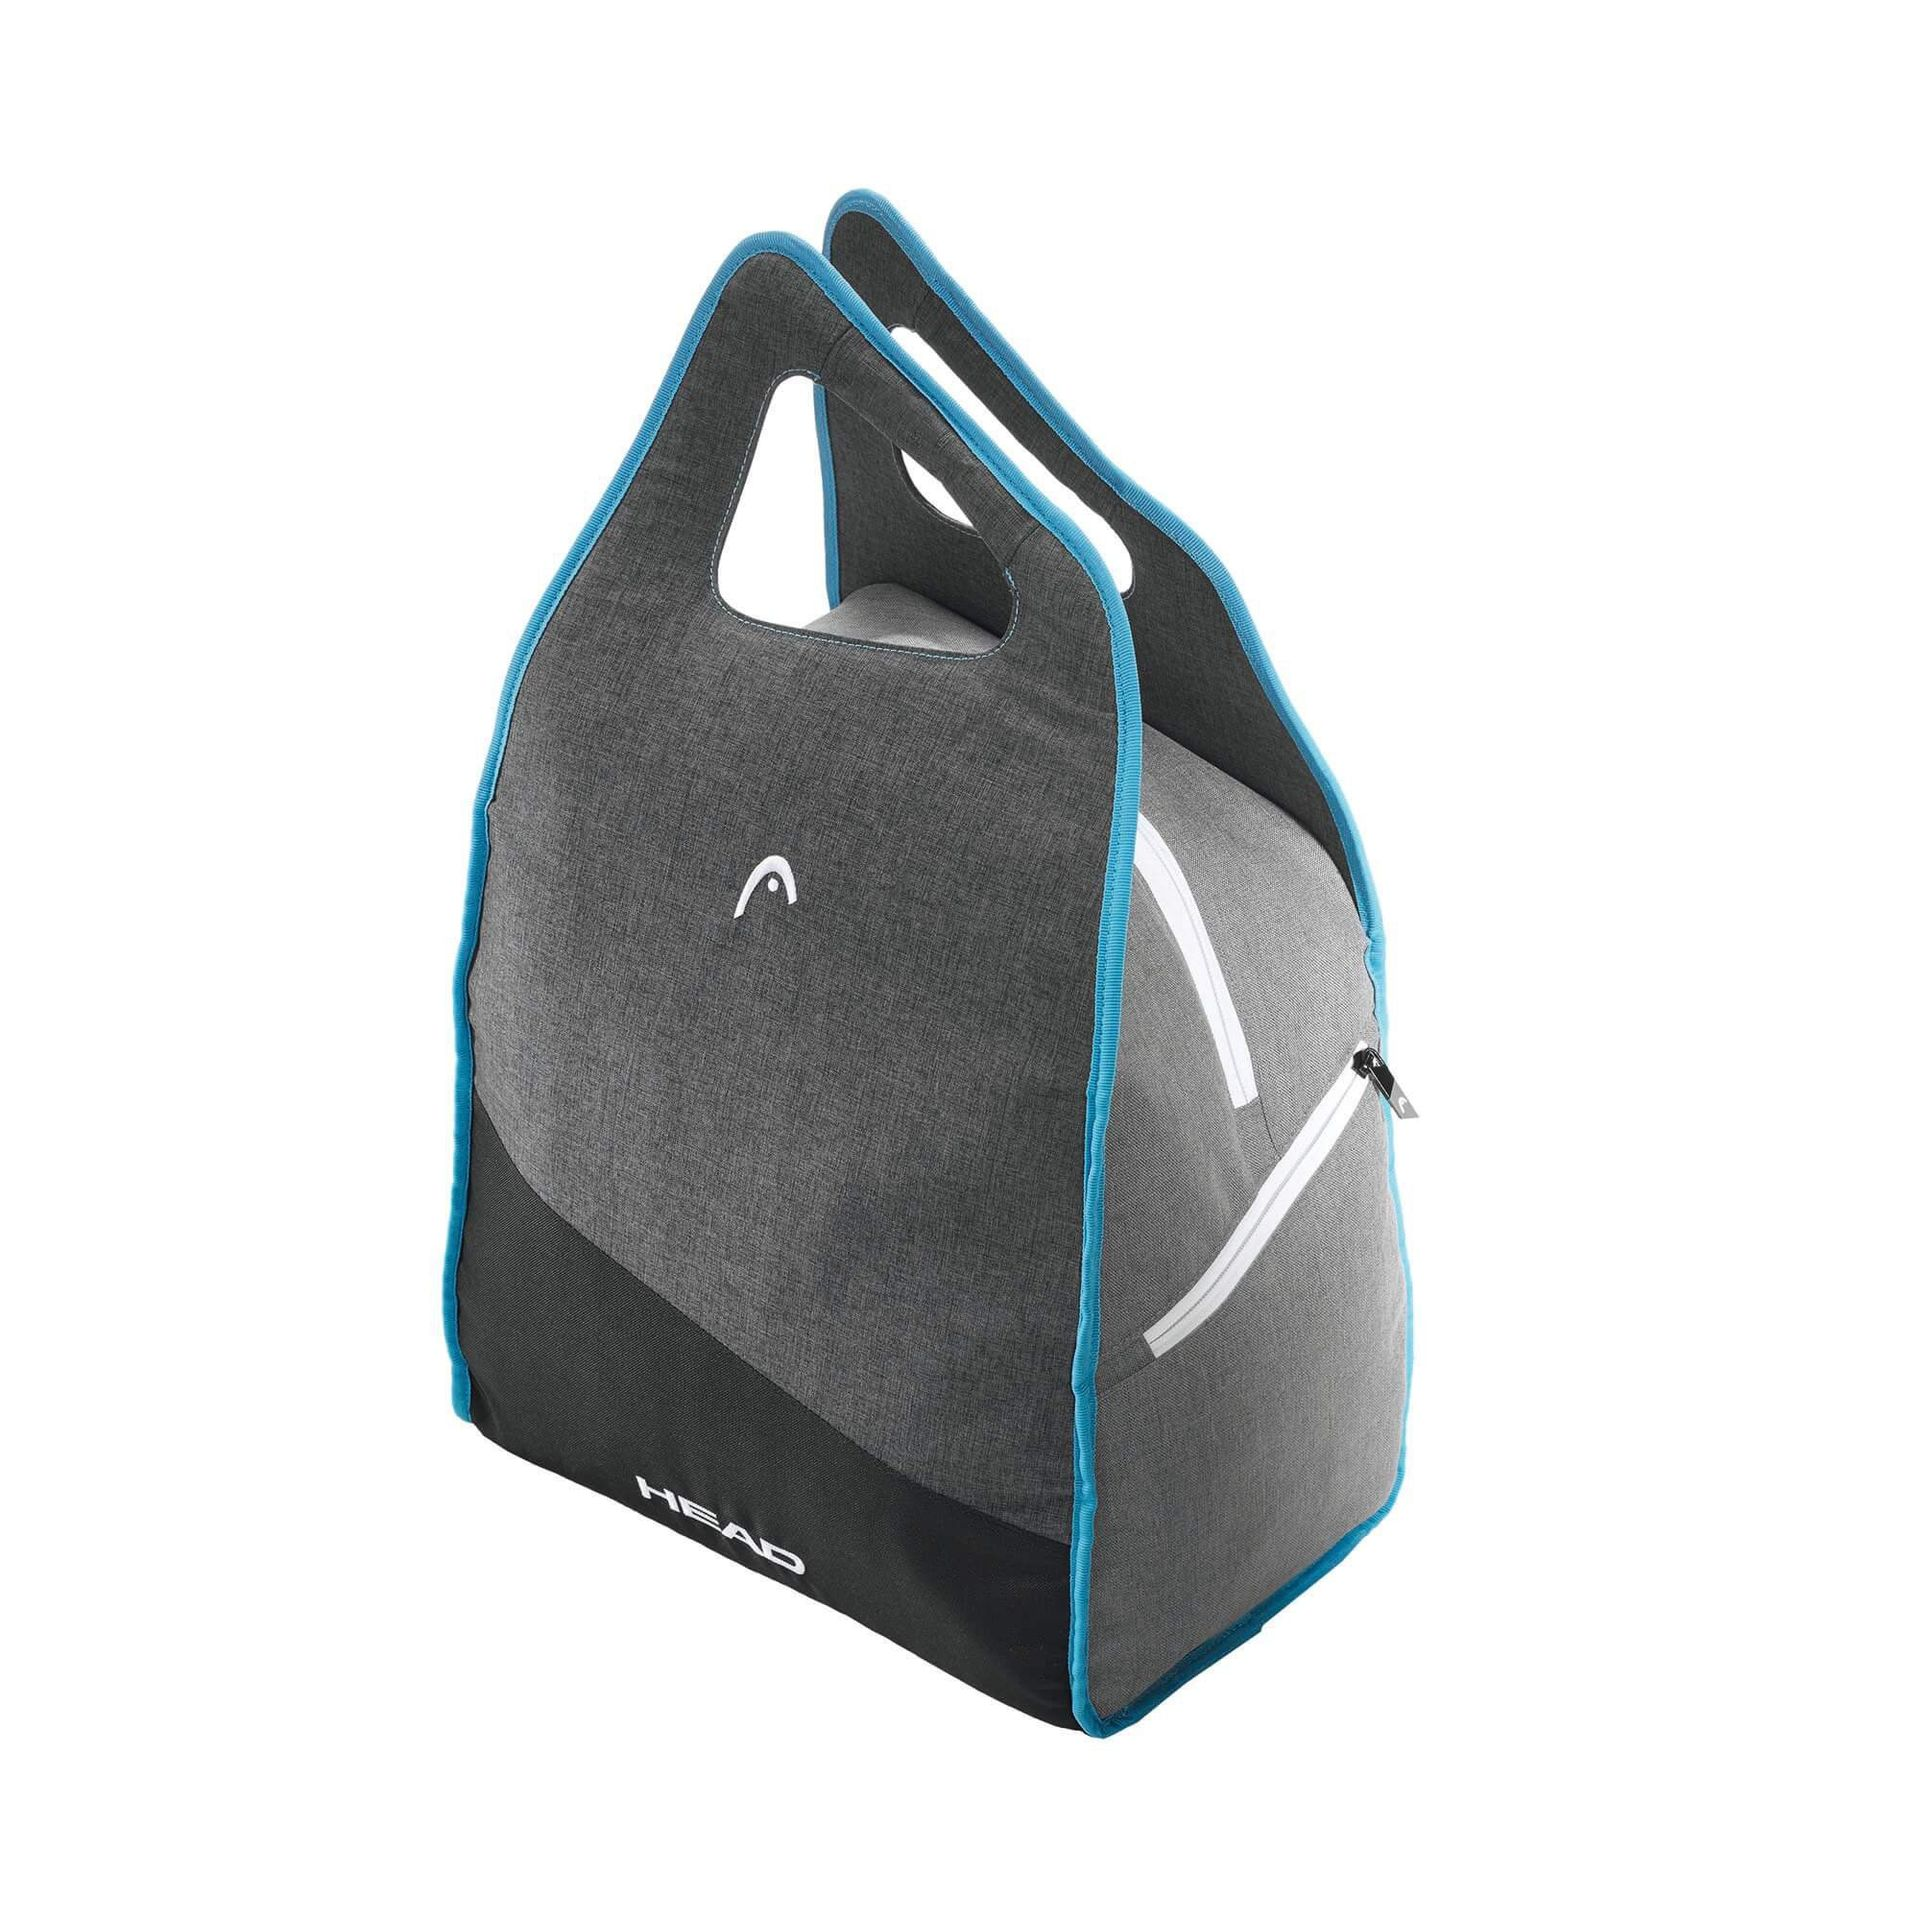 TORBA NA BUTY NARCIARSKIE HEAD WOMAN BOOT BAG 383177 1